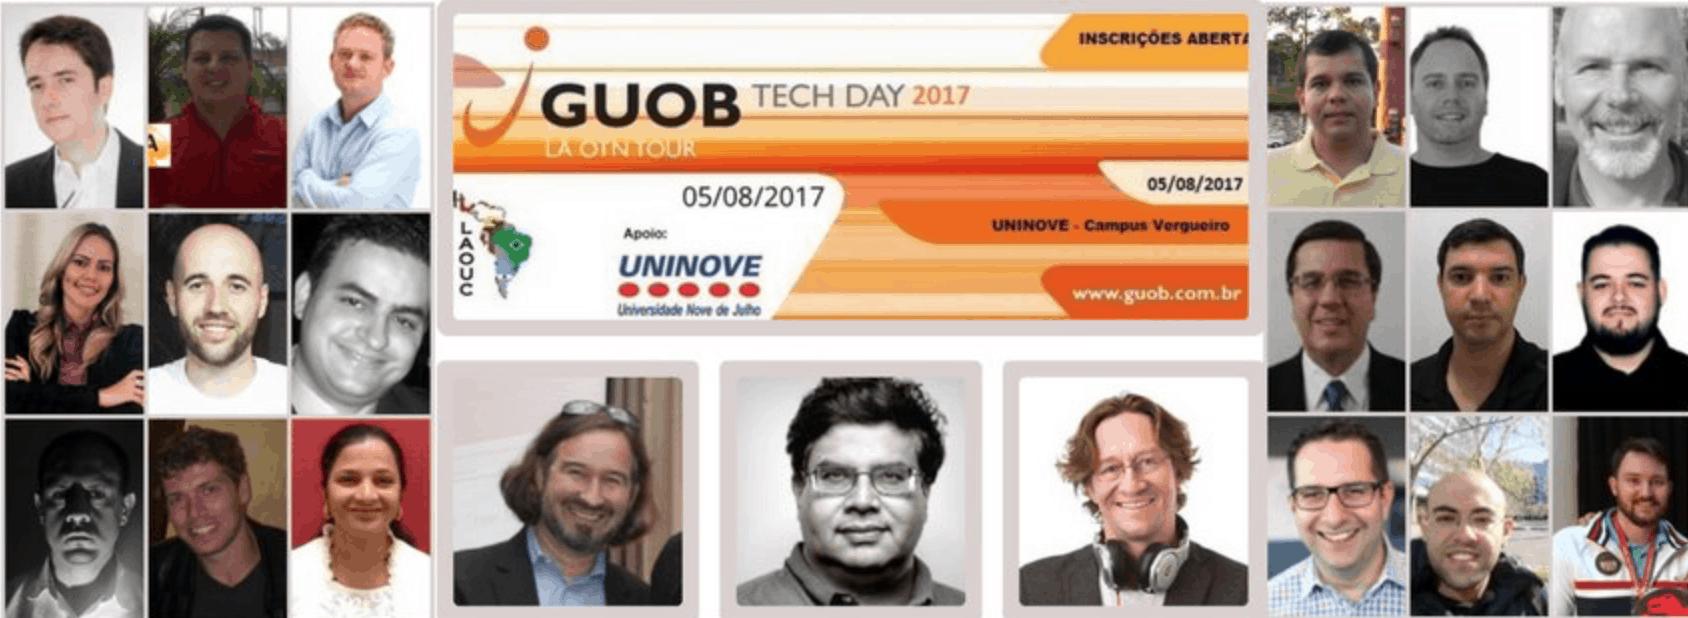 Vem aí: GUOB Tech Day 2017 / LAD OTN Tour